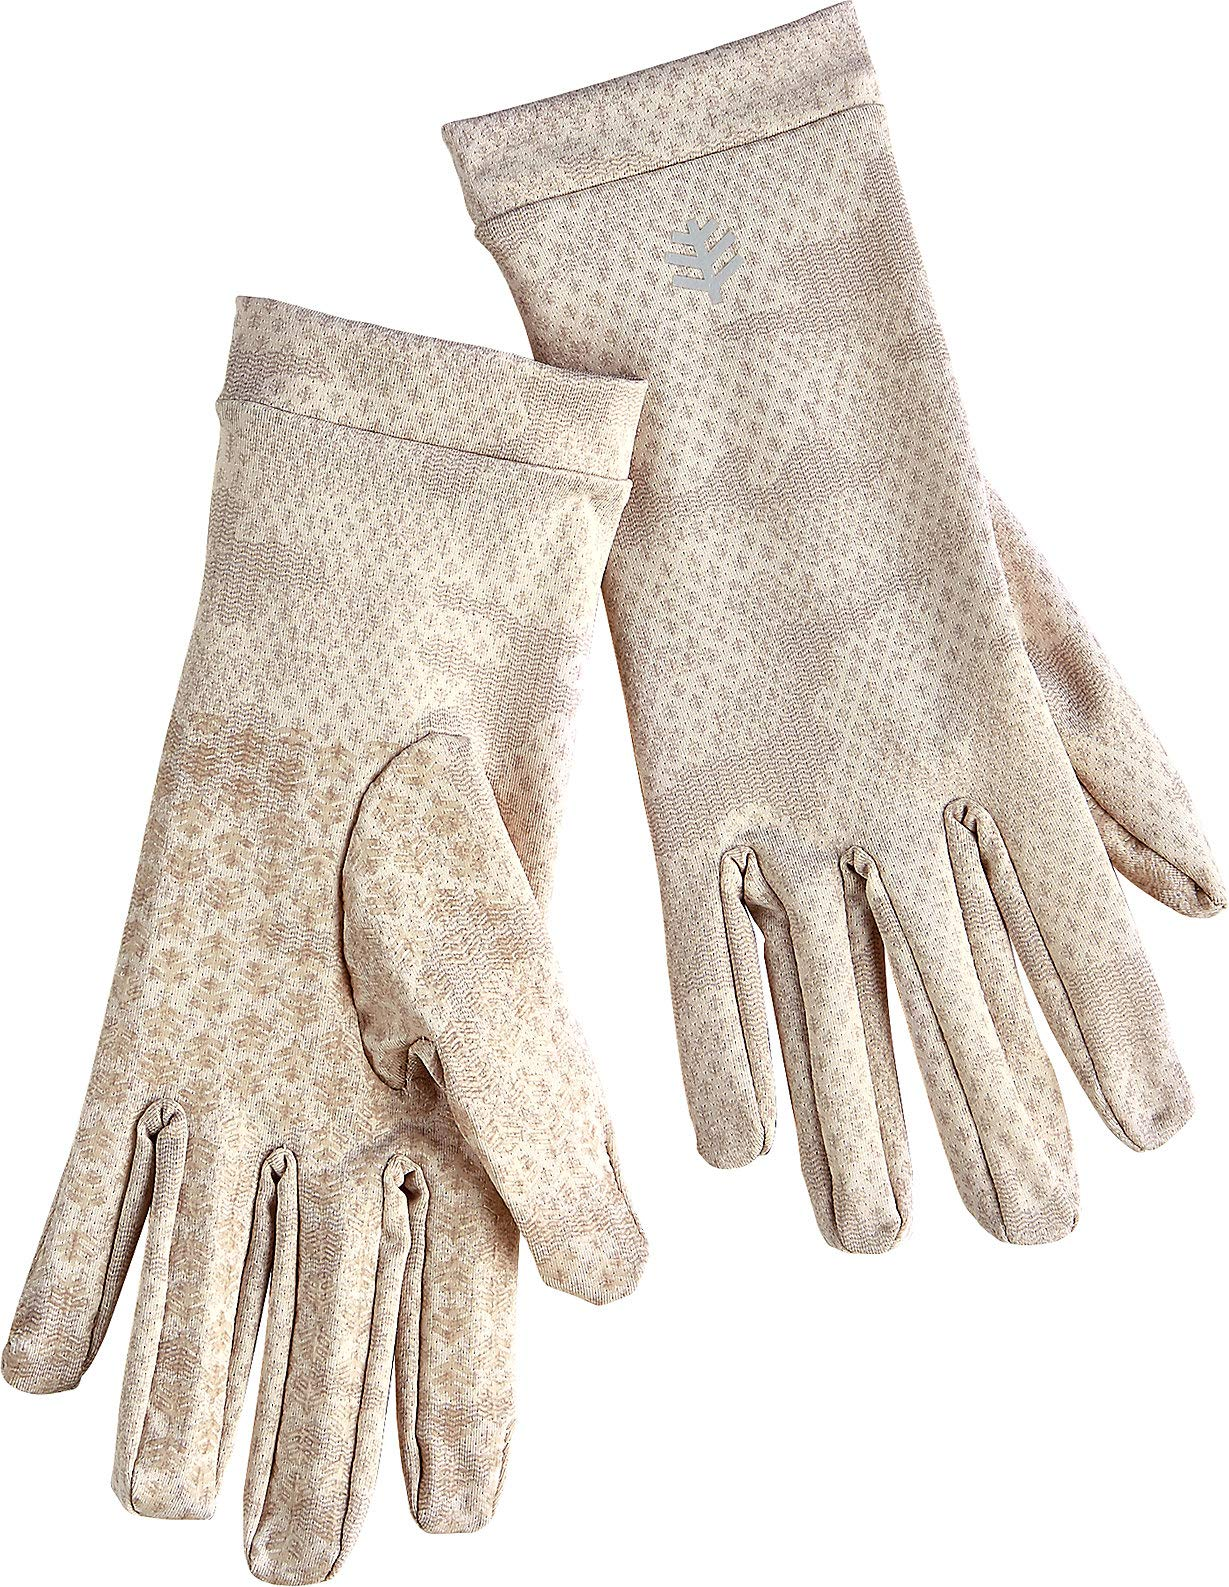 Coolibar UPF 50+ Unisex Sun Gloves - Sun Protective (Medium- Tan Coolibar Camo)